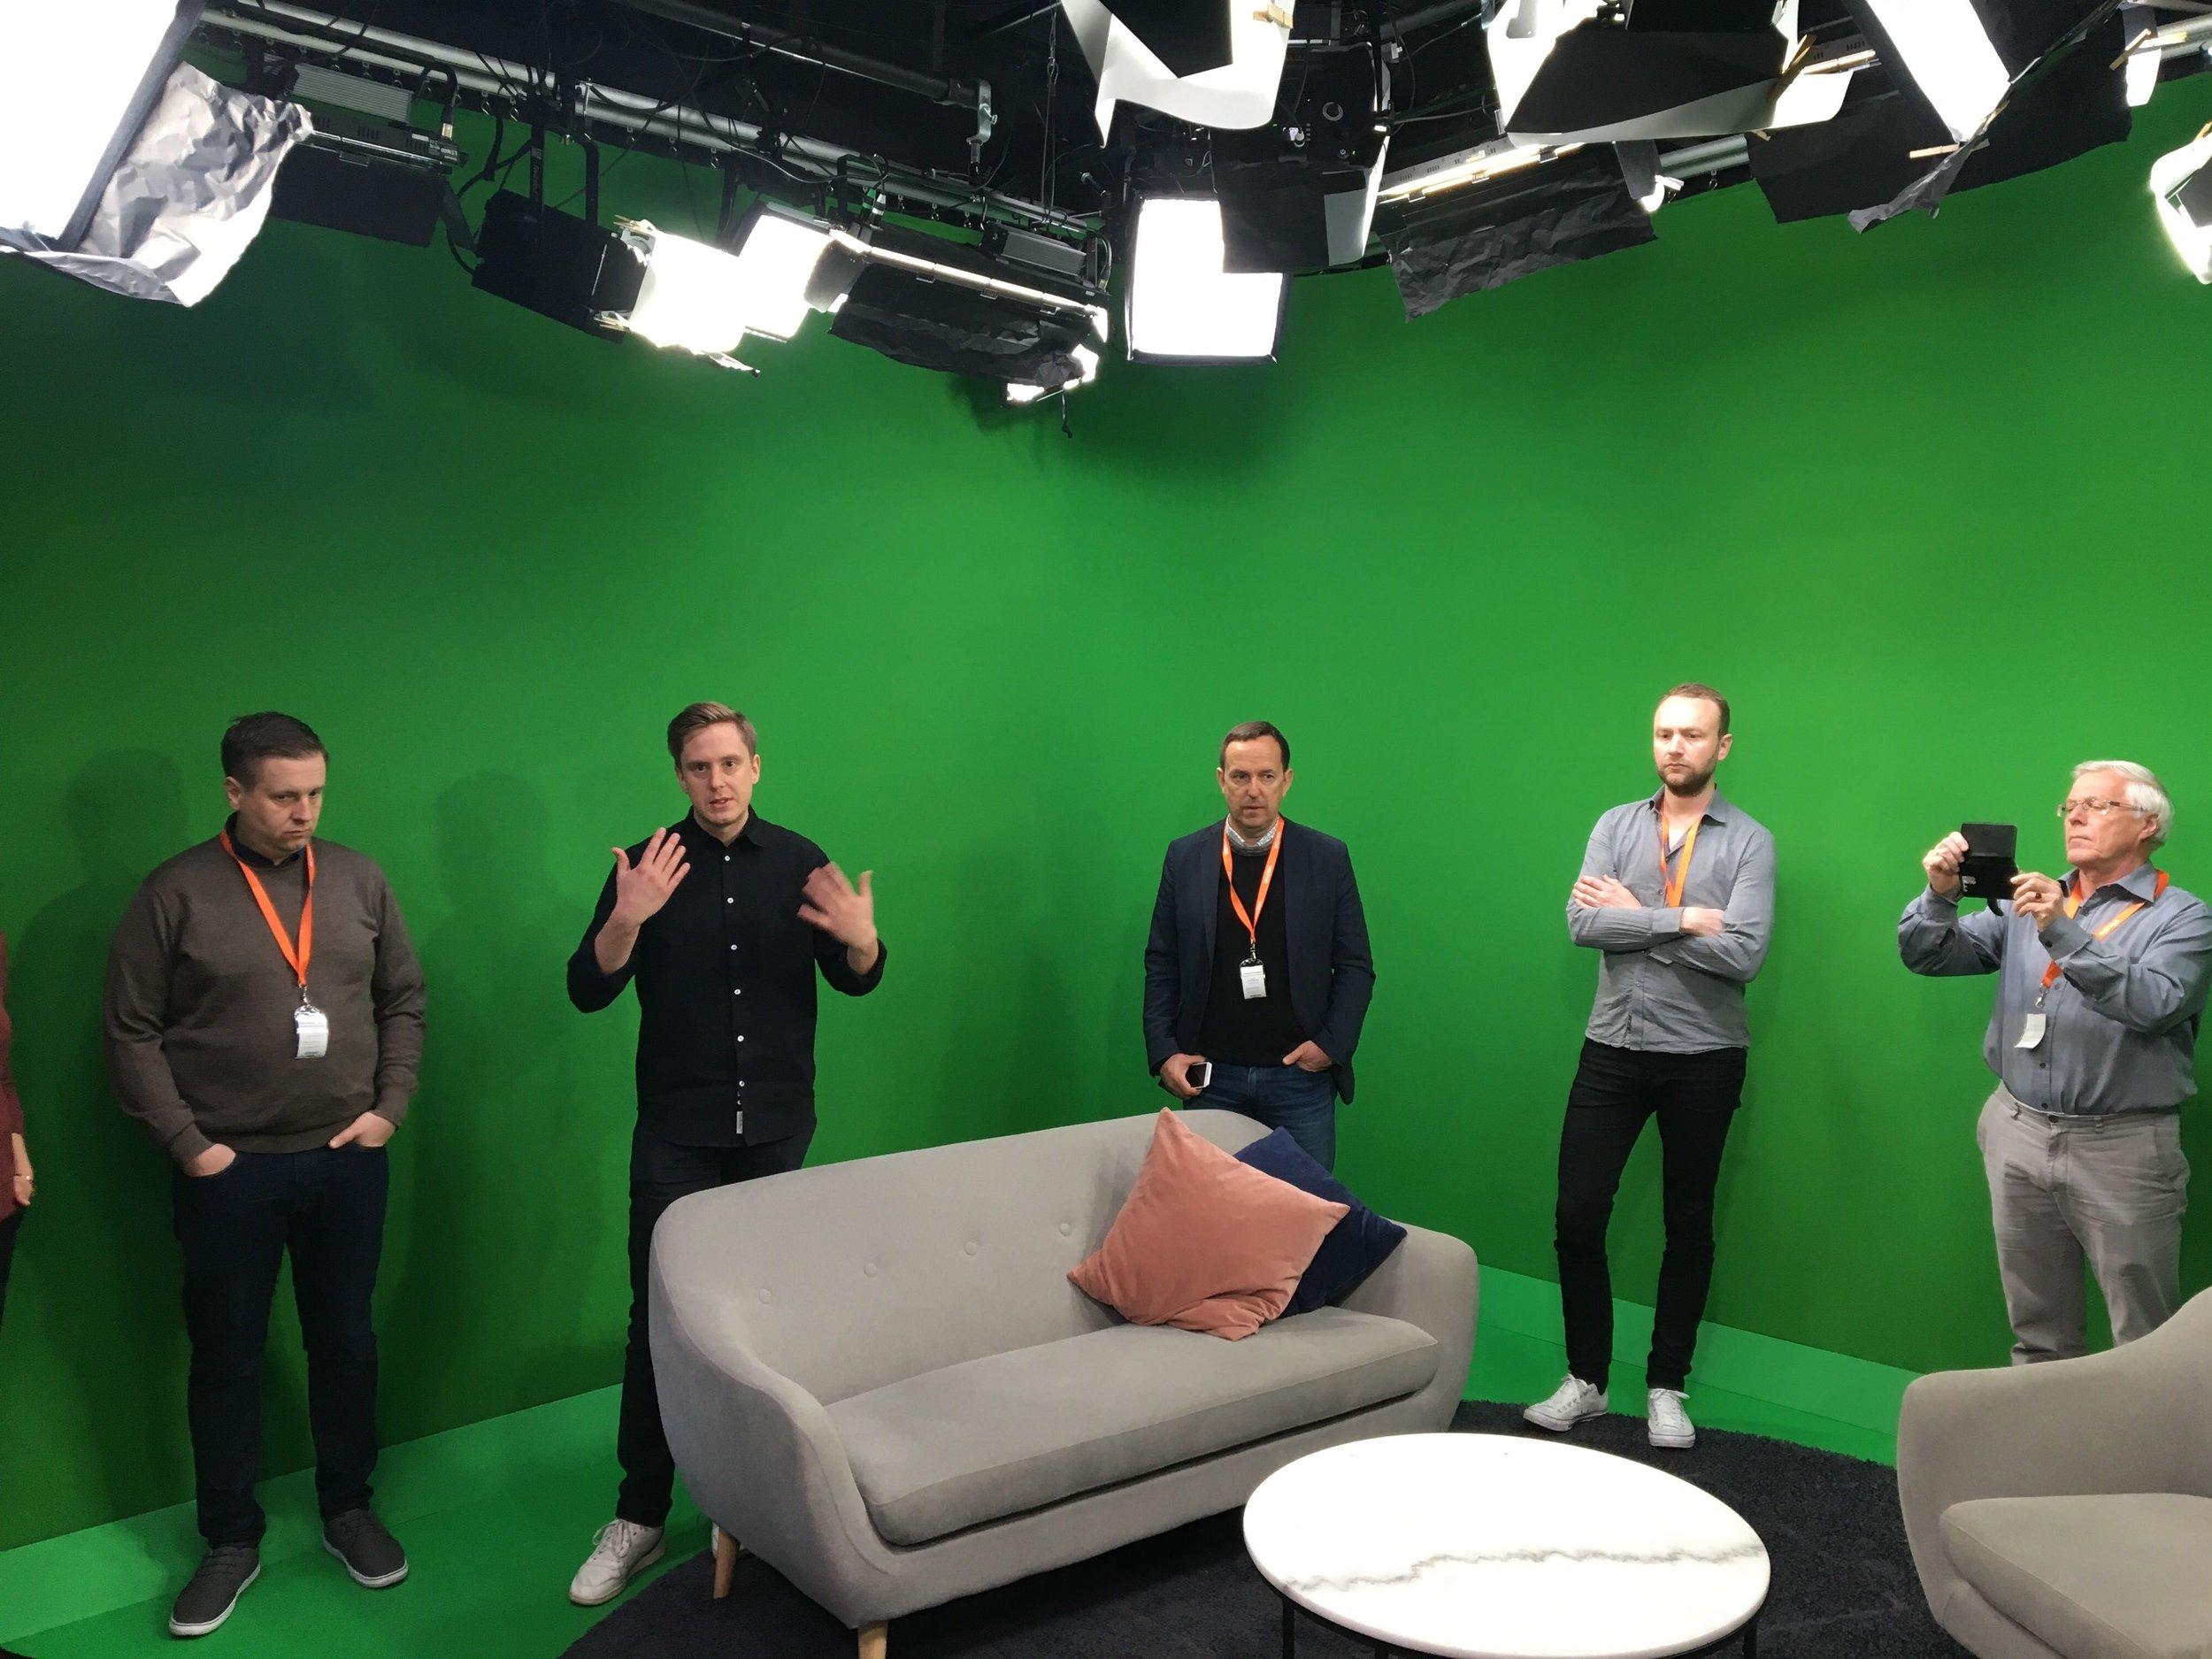 På besøk i Expressens studio. Fra venstre Eirikur Asgeirsson (Island), Martin Heinius (sportssjef Expressen tv), Gunnar Grindstein (Norge), Daniel Rooth (Sverige) og Flemming Olesen (Danmark). FOTO: Reidar Sollie